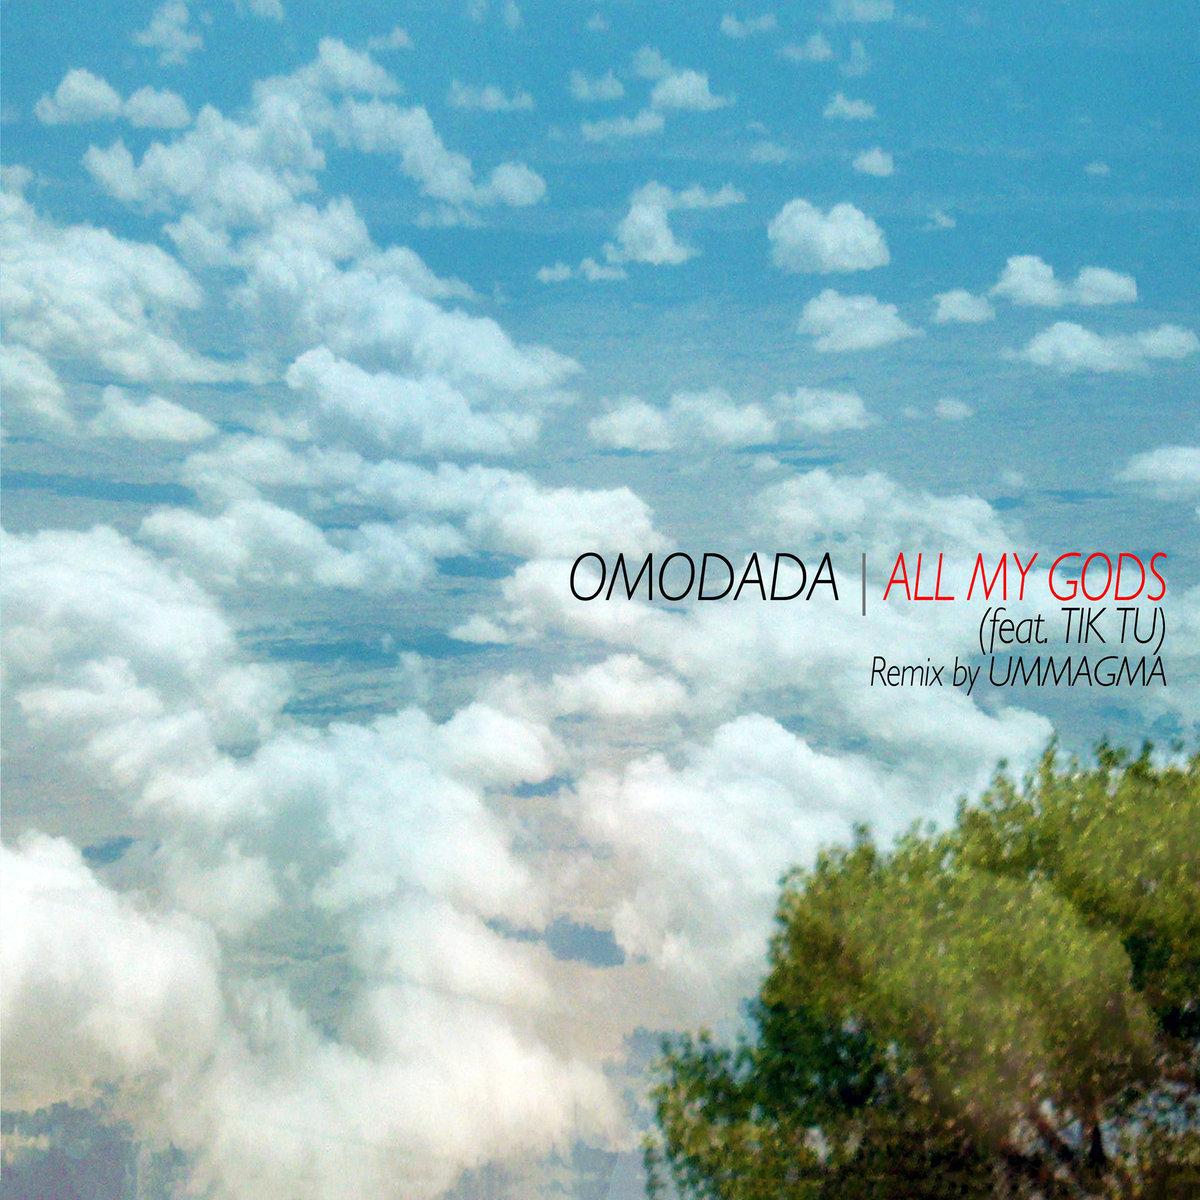 Omodada, All My Gods